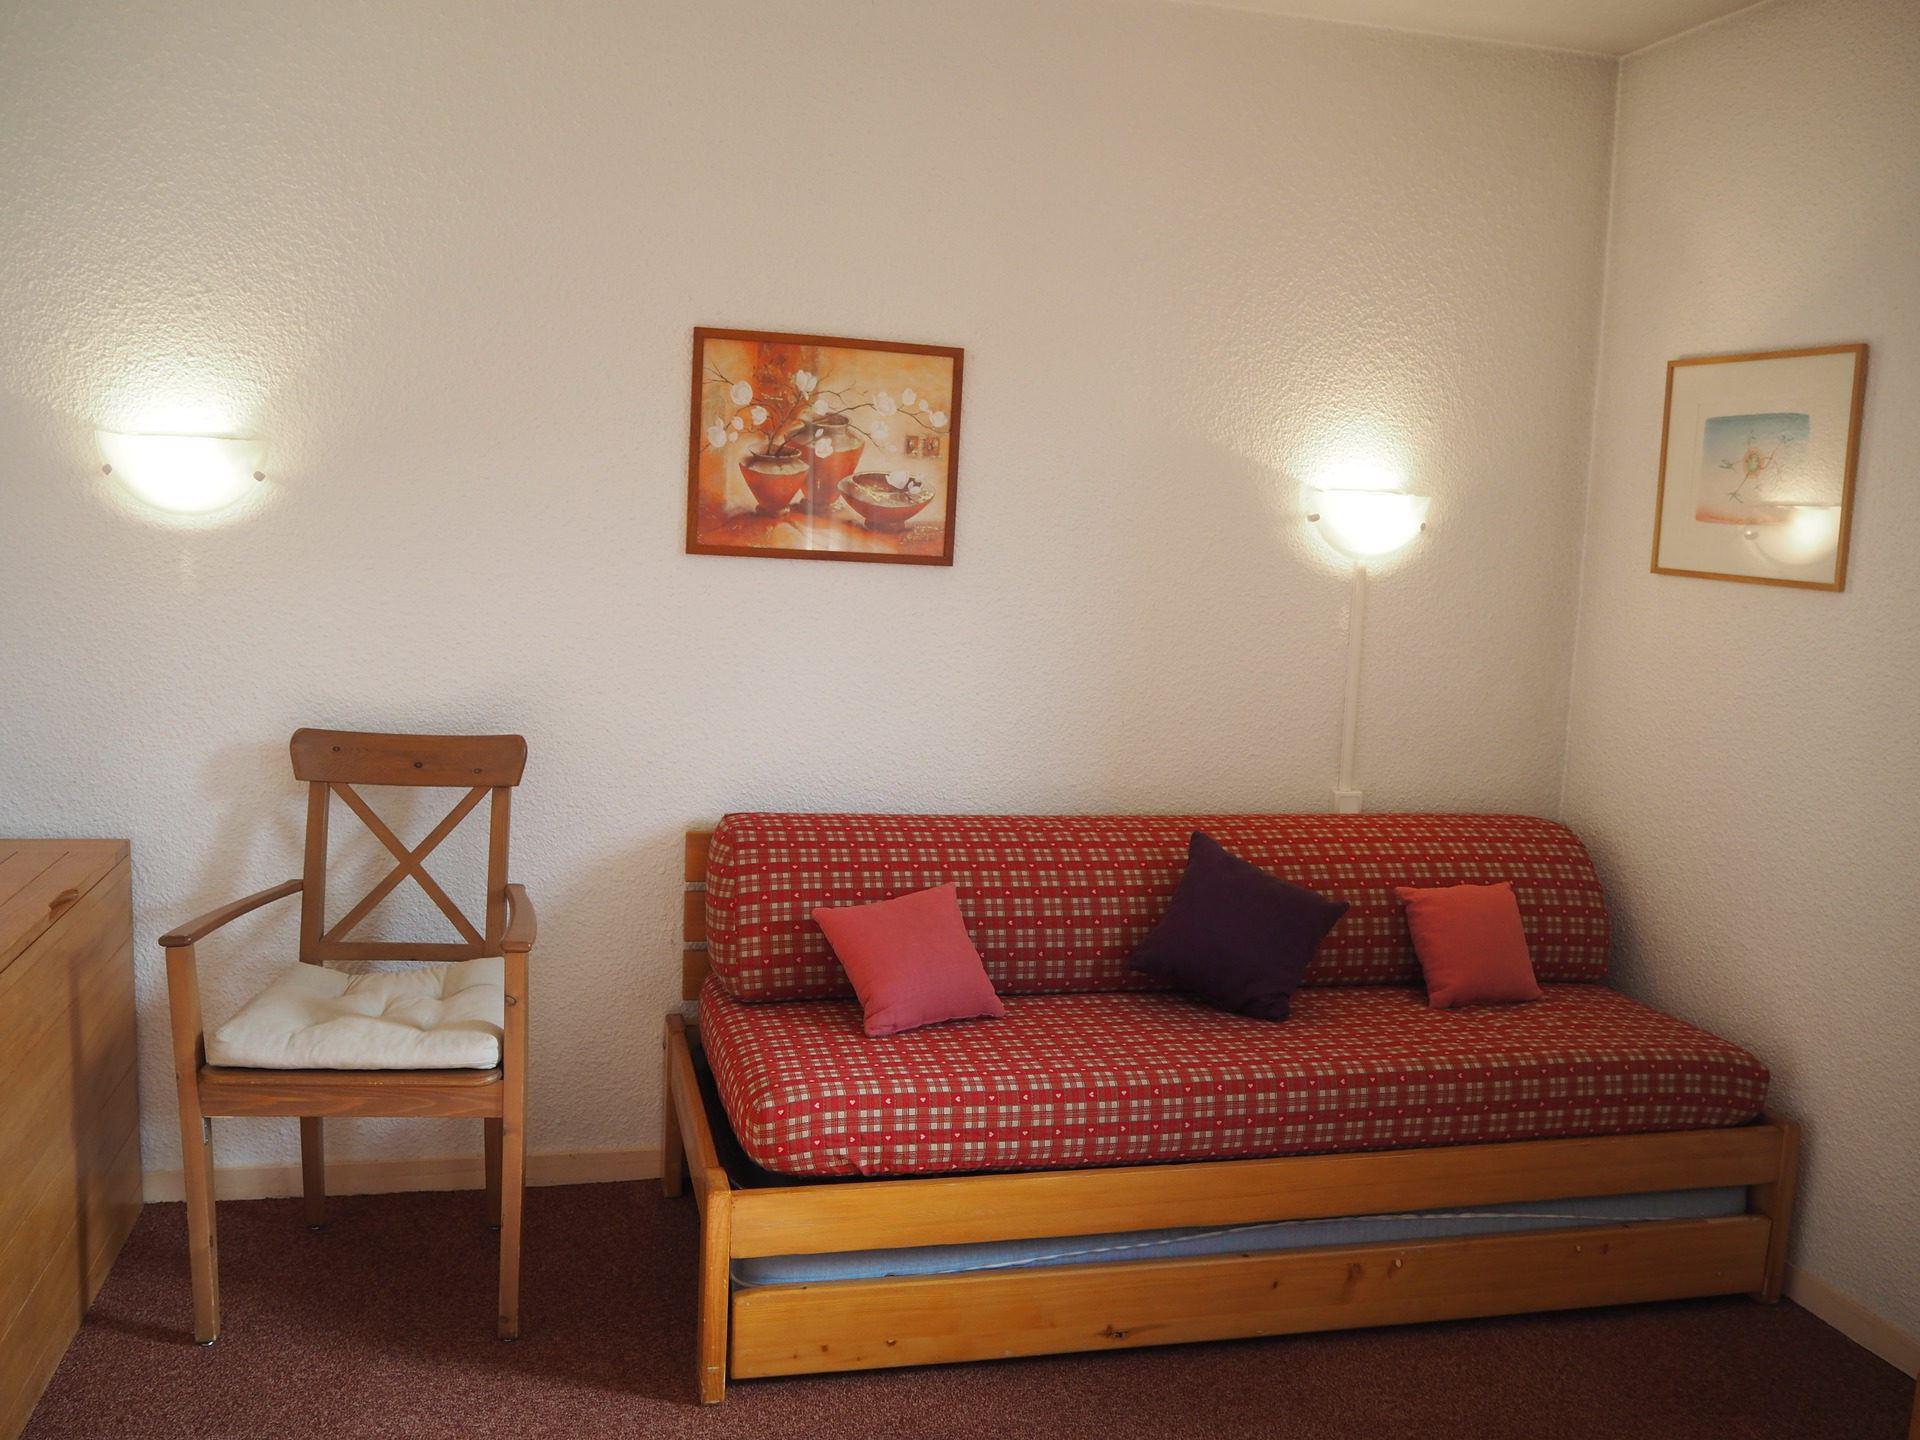 2 Rooms 4 Pers ski-in ski-out / SOLDANELLES B 212